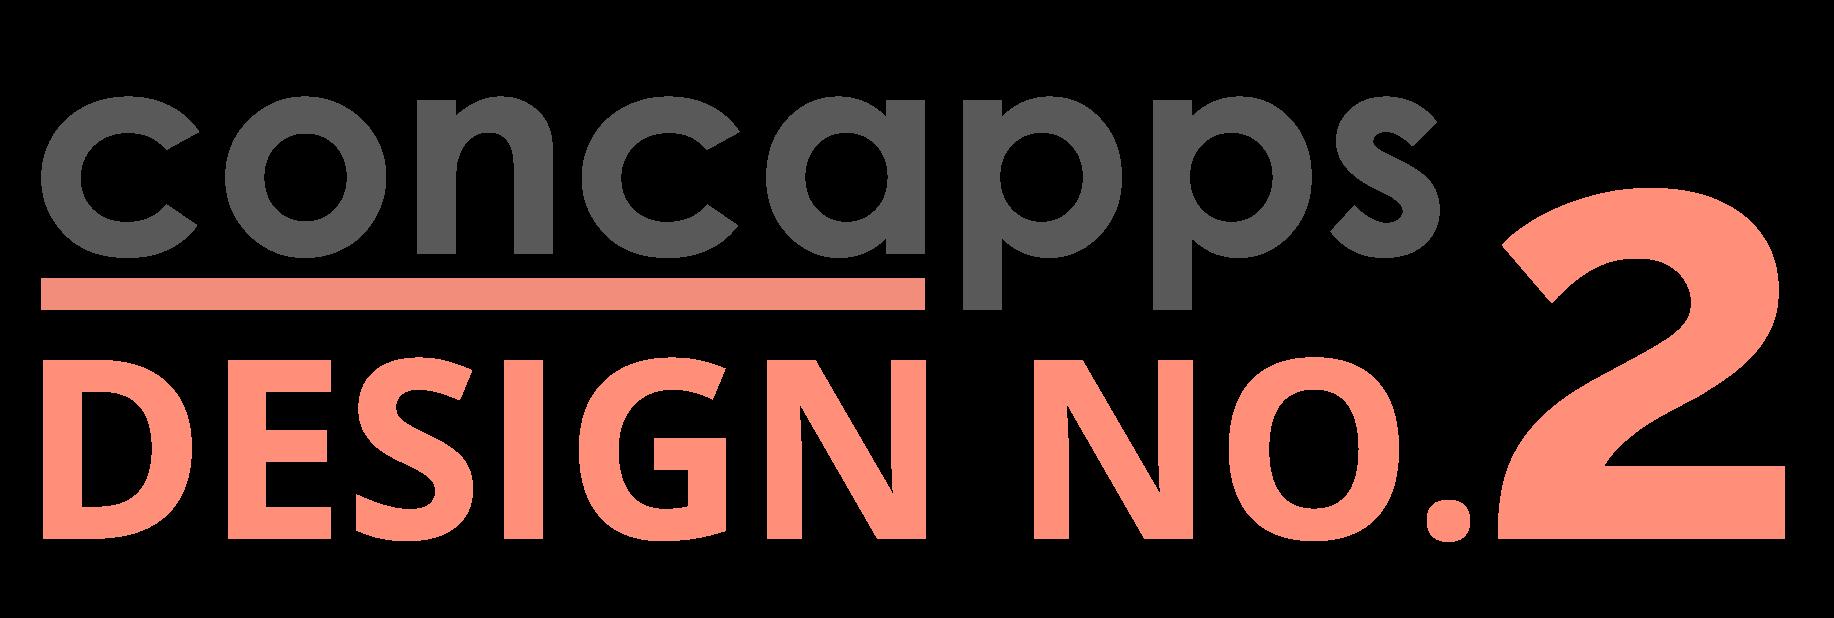 Concapps